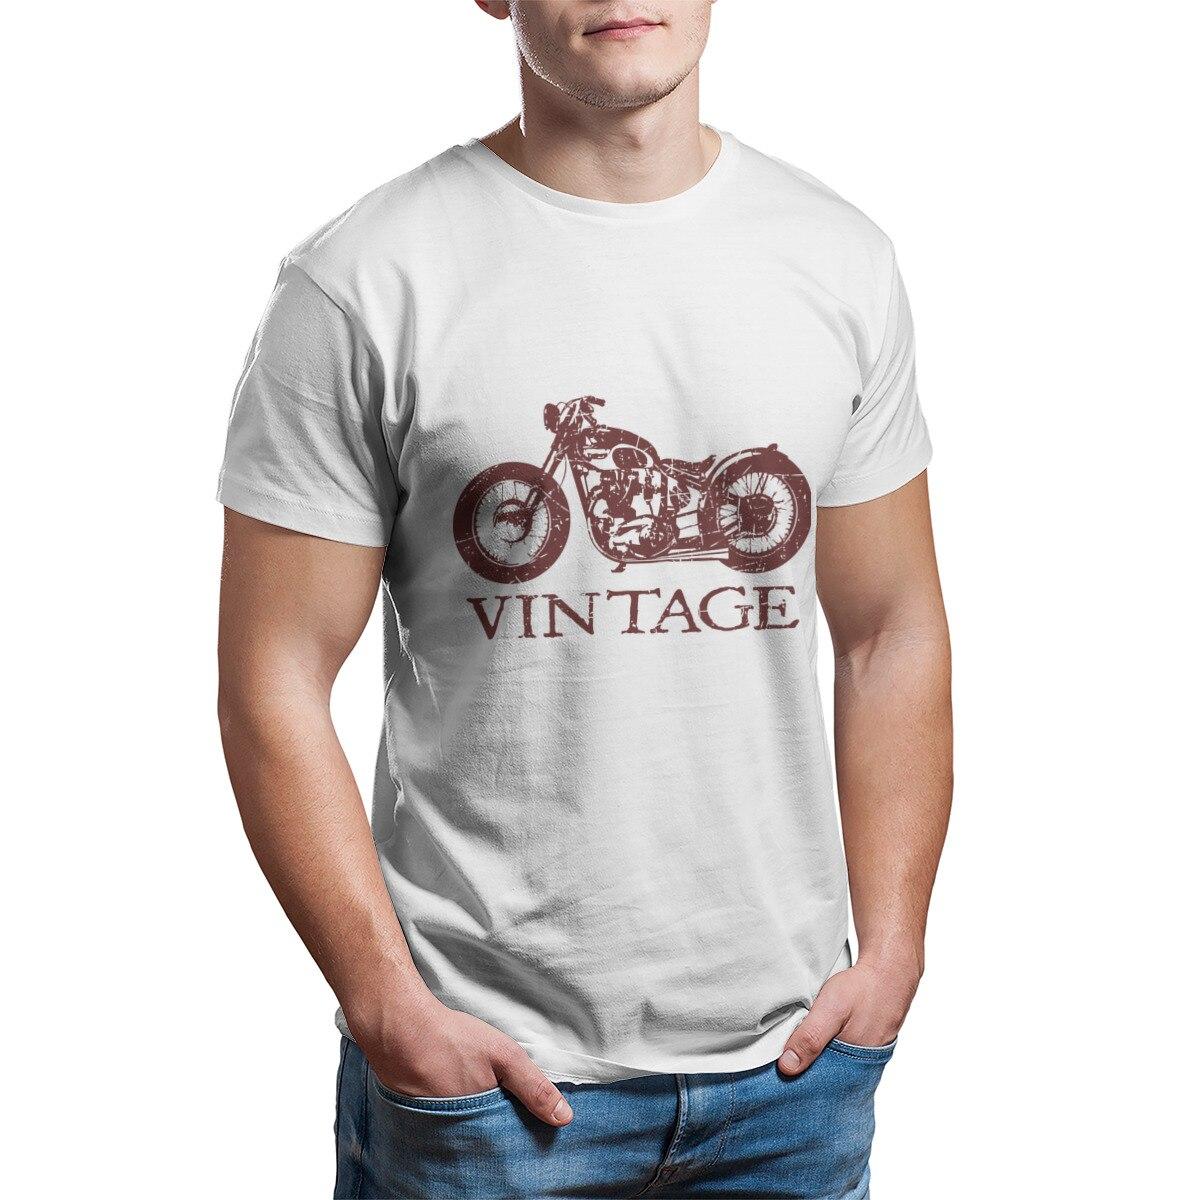 Vintage Triumph T-shirt Essentials Groothandel Kleding Punk Tops 4XL 5XL 6XL Roze Grappige Gift Nieuws 2021 Vrouwelijke Heren Kleding 13125